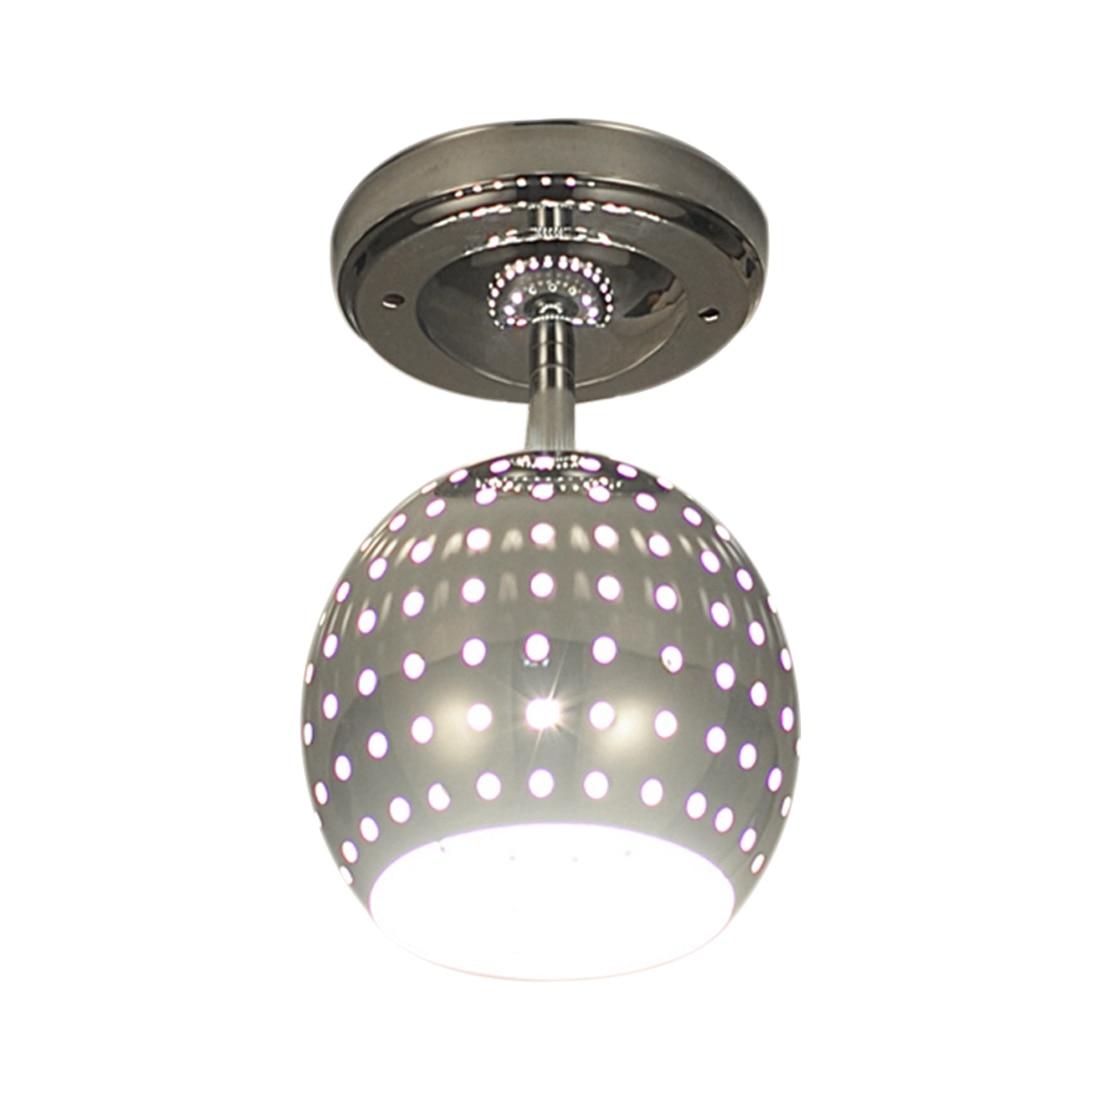 CNIM Hot New Modern Scattering Pendant Lamp Fixture Lighting LED Chandelier